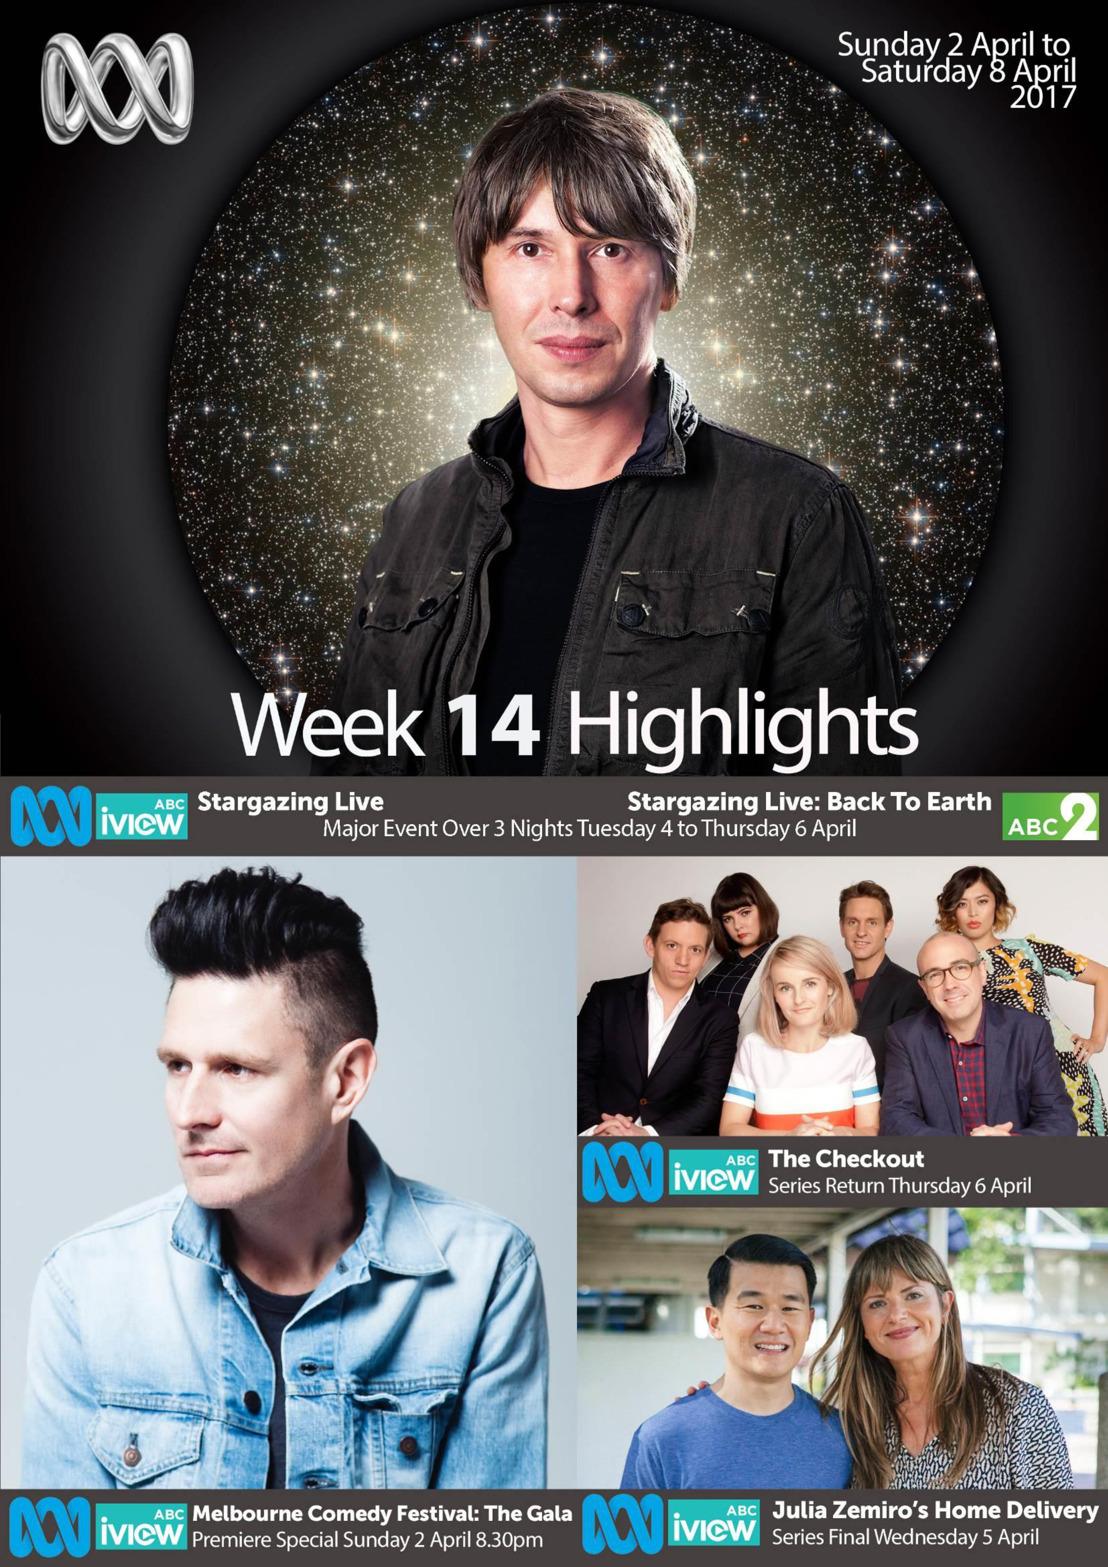 ABC Program Highlights - Week 14